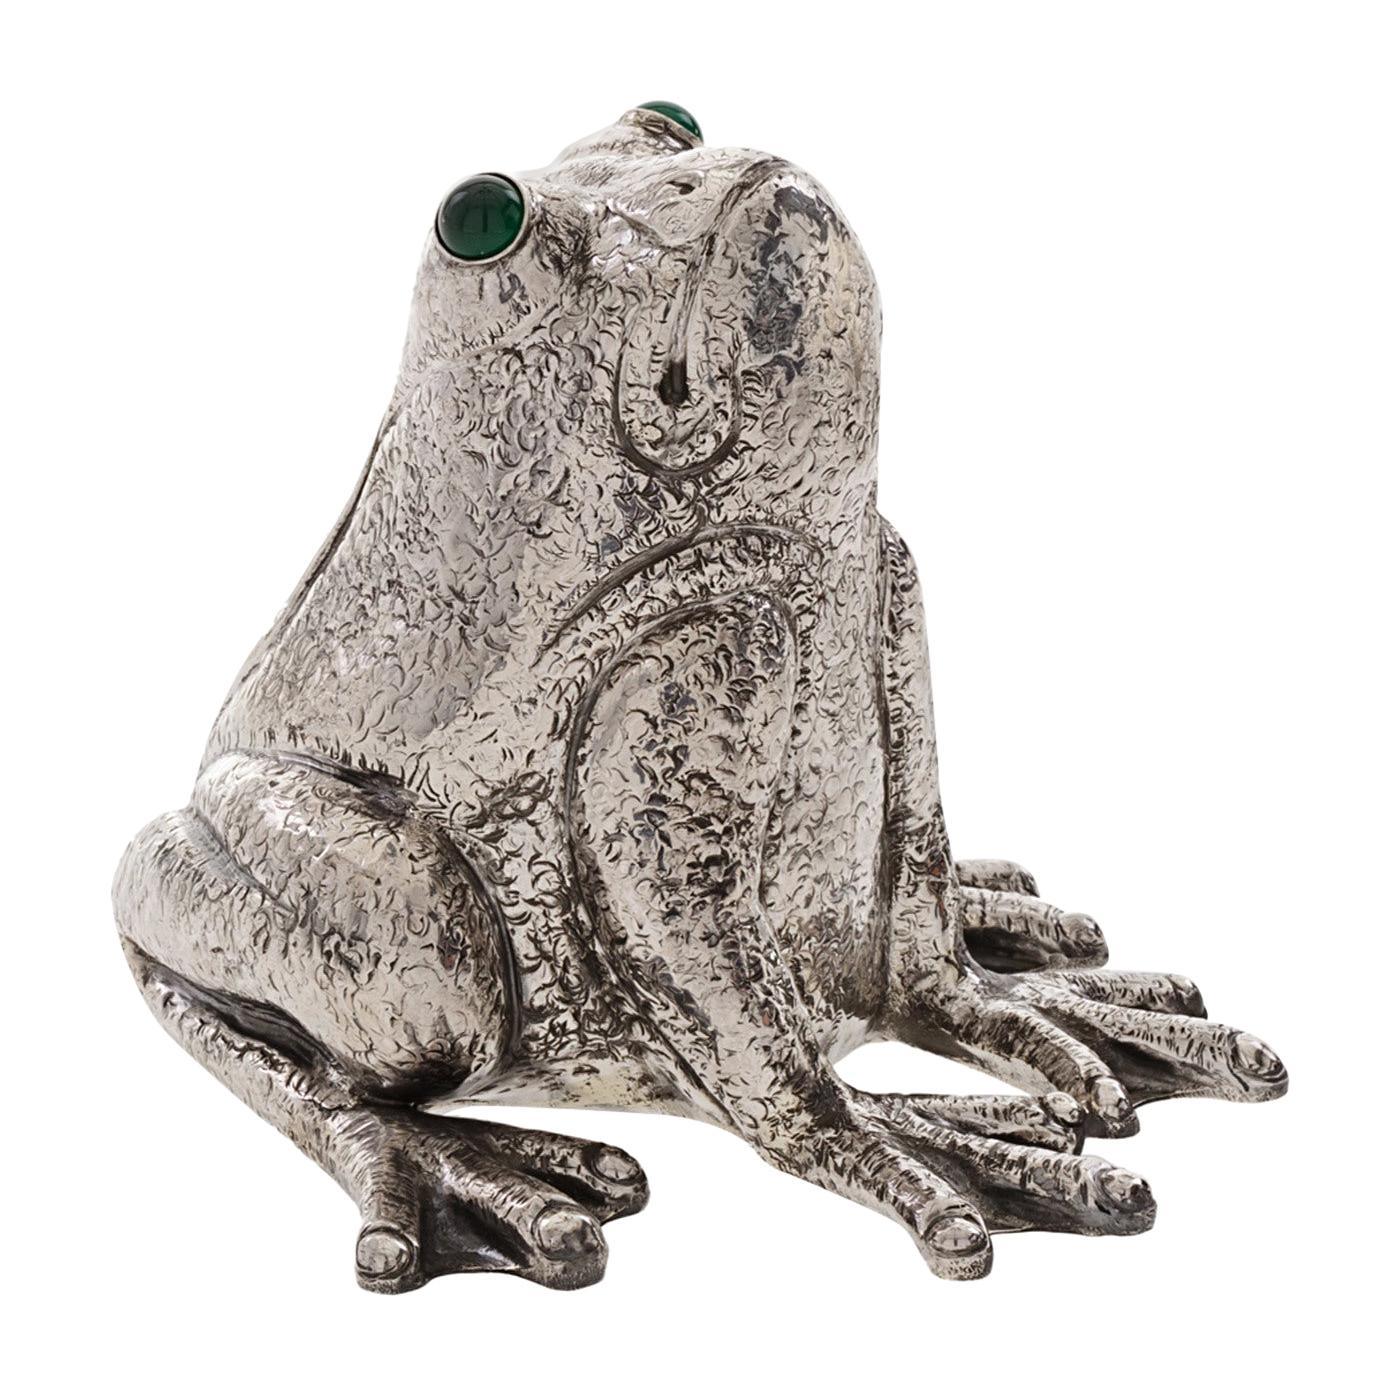 The Frog Sterling Silver Lighter